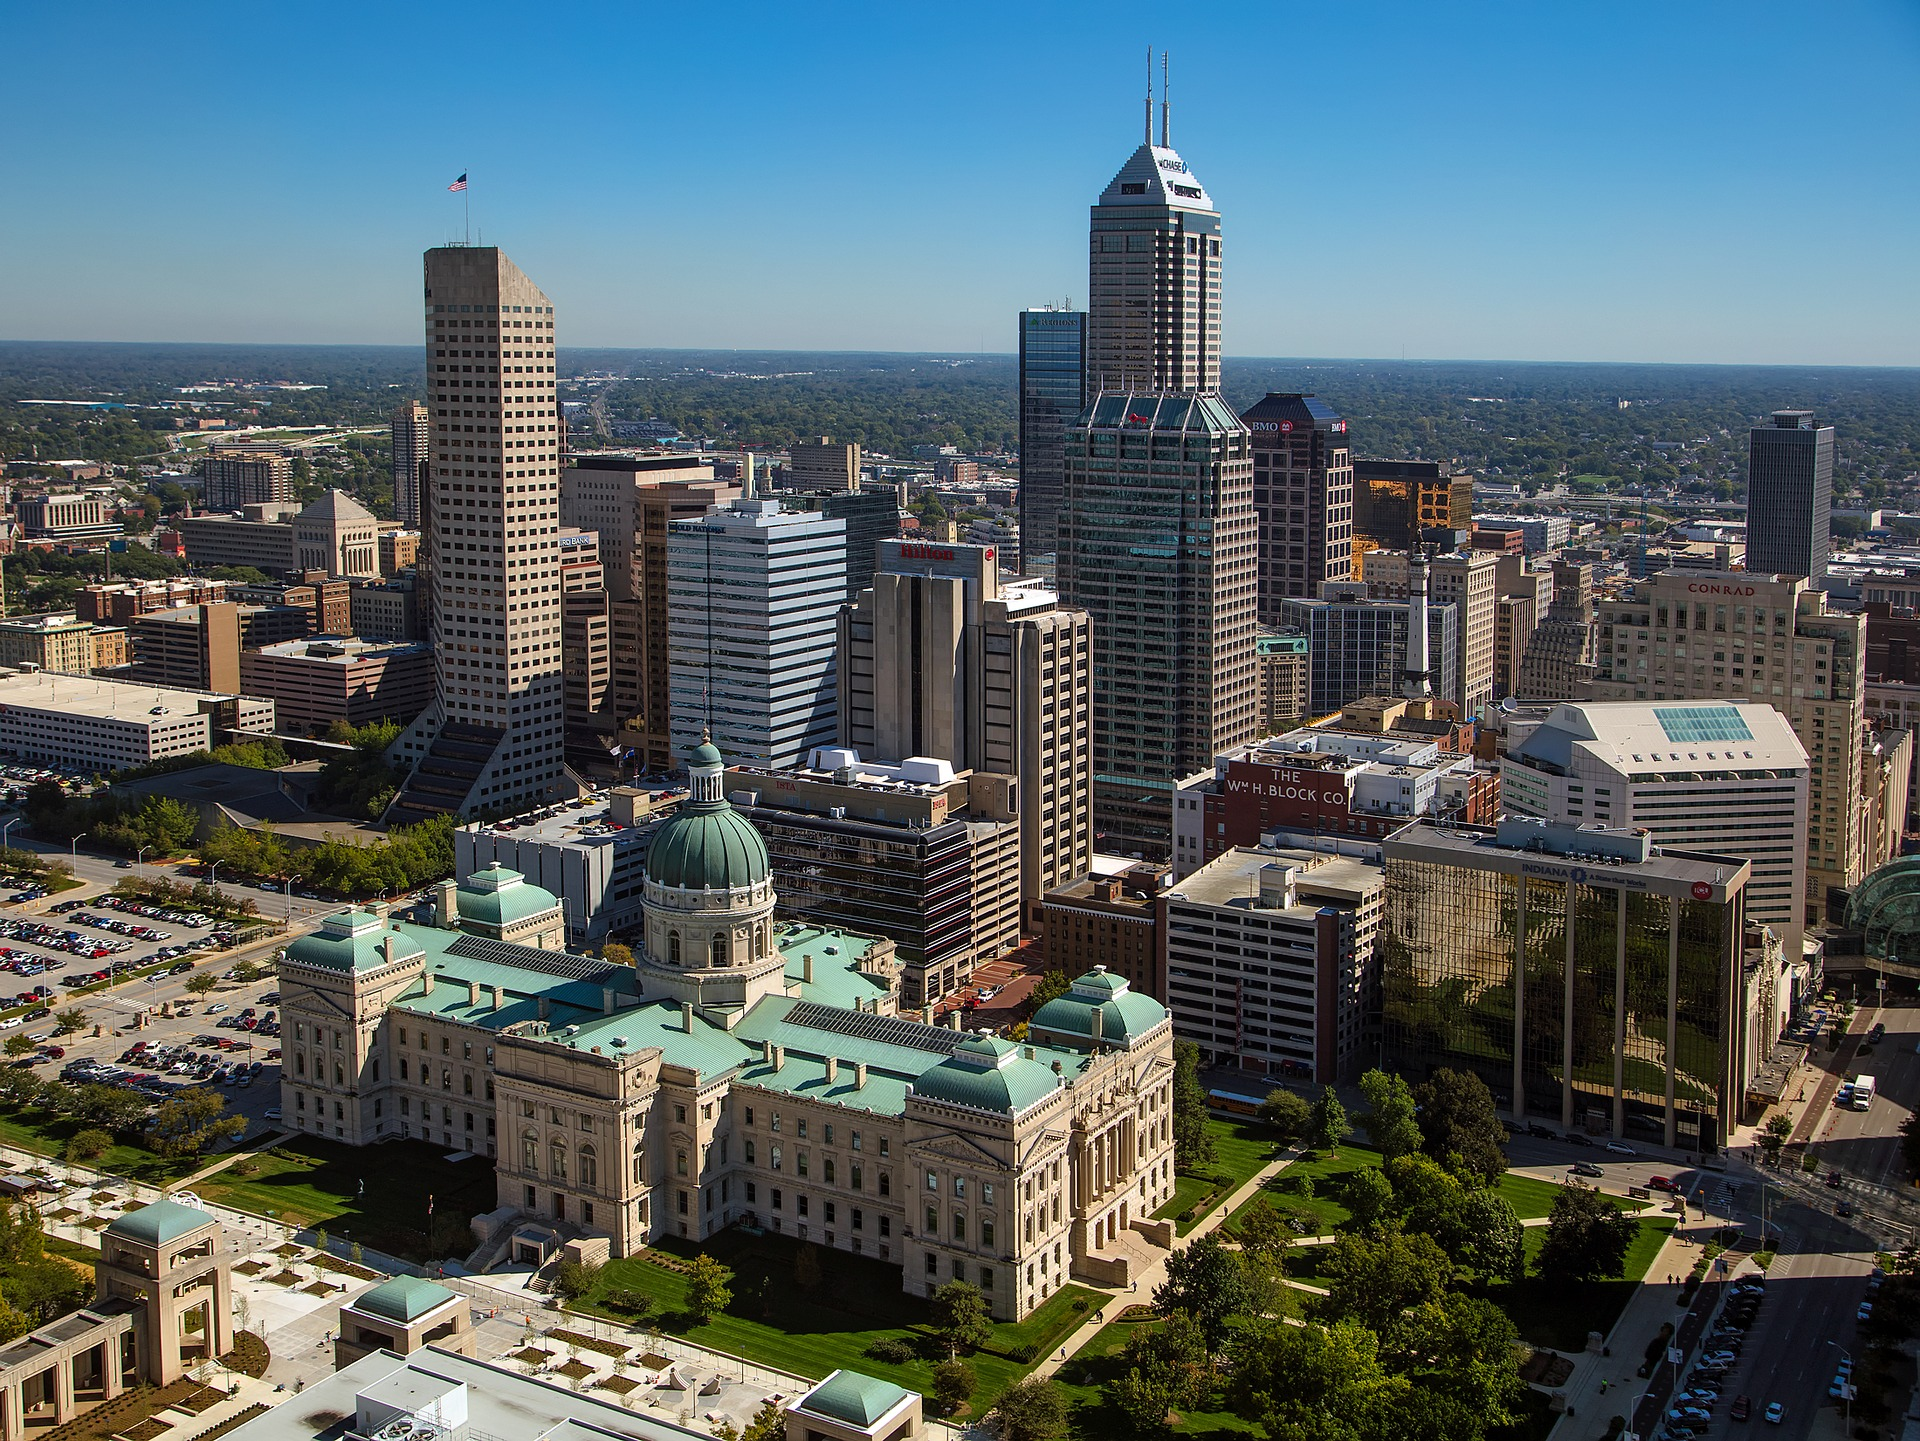 4/Indianapolis, Indiana